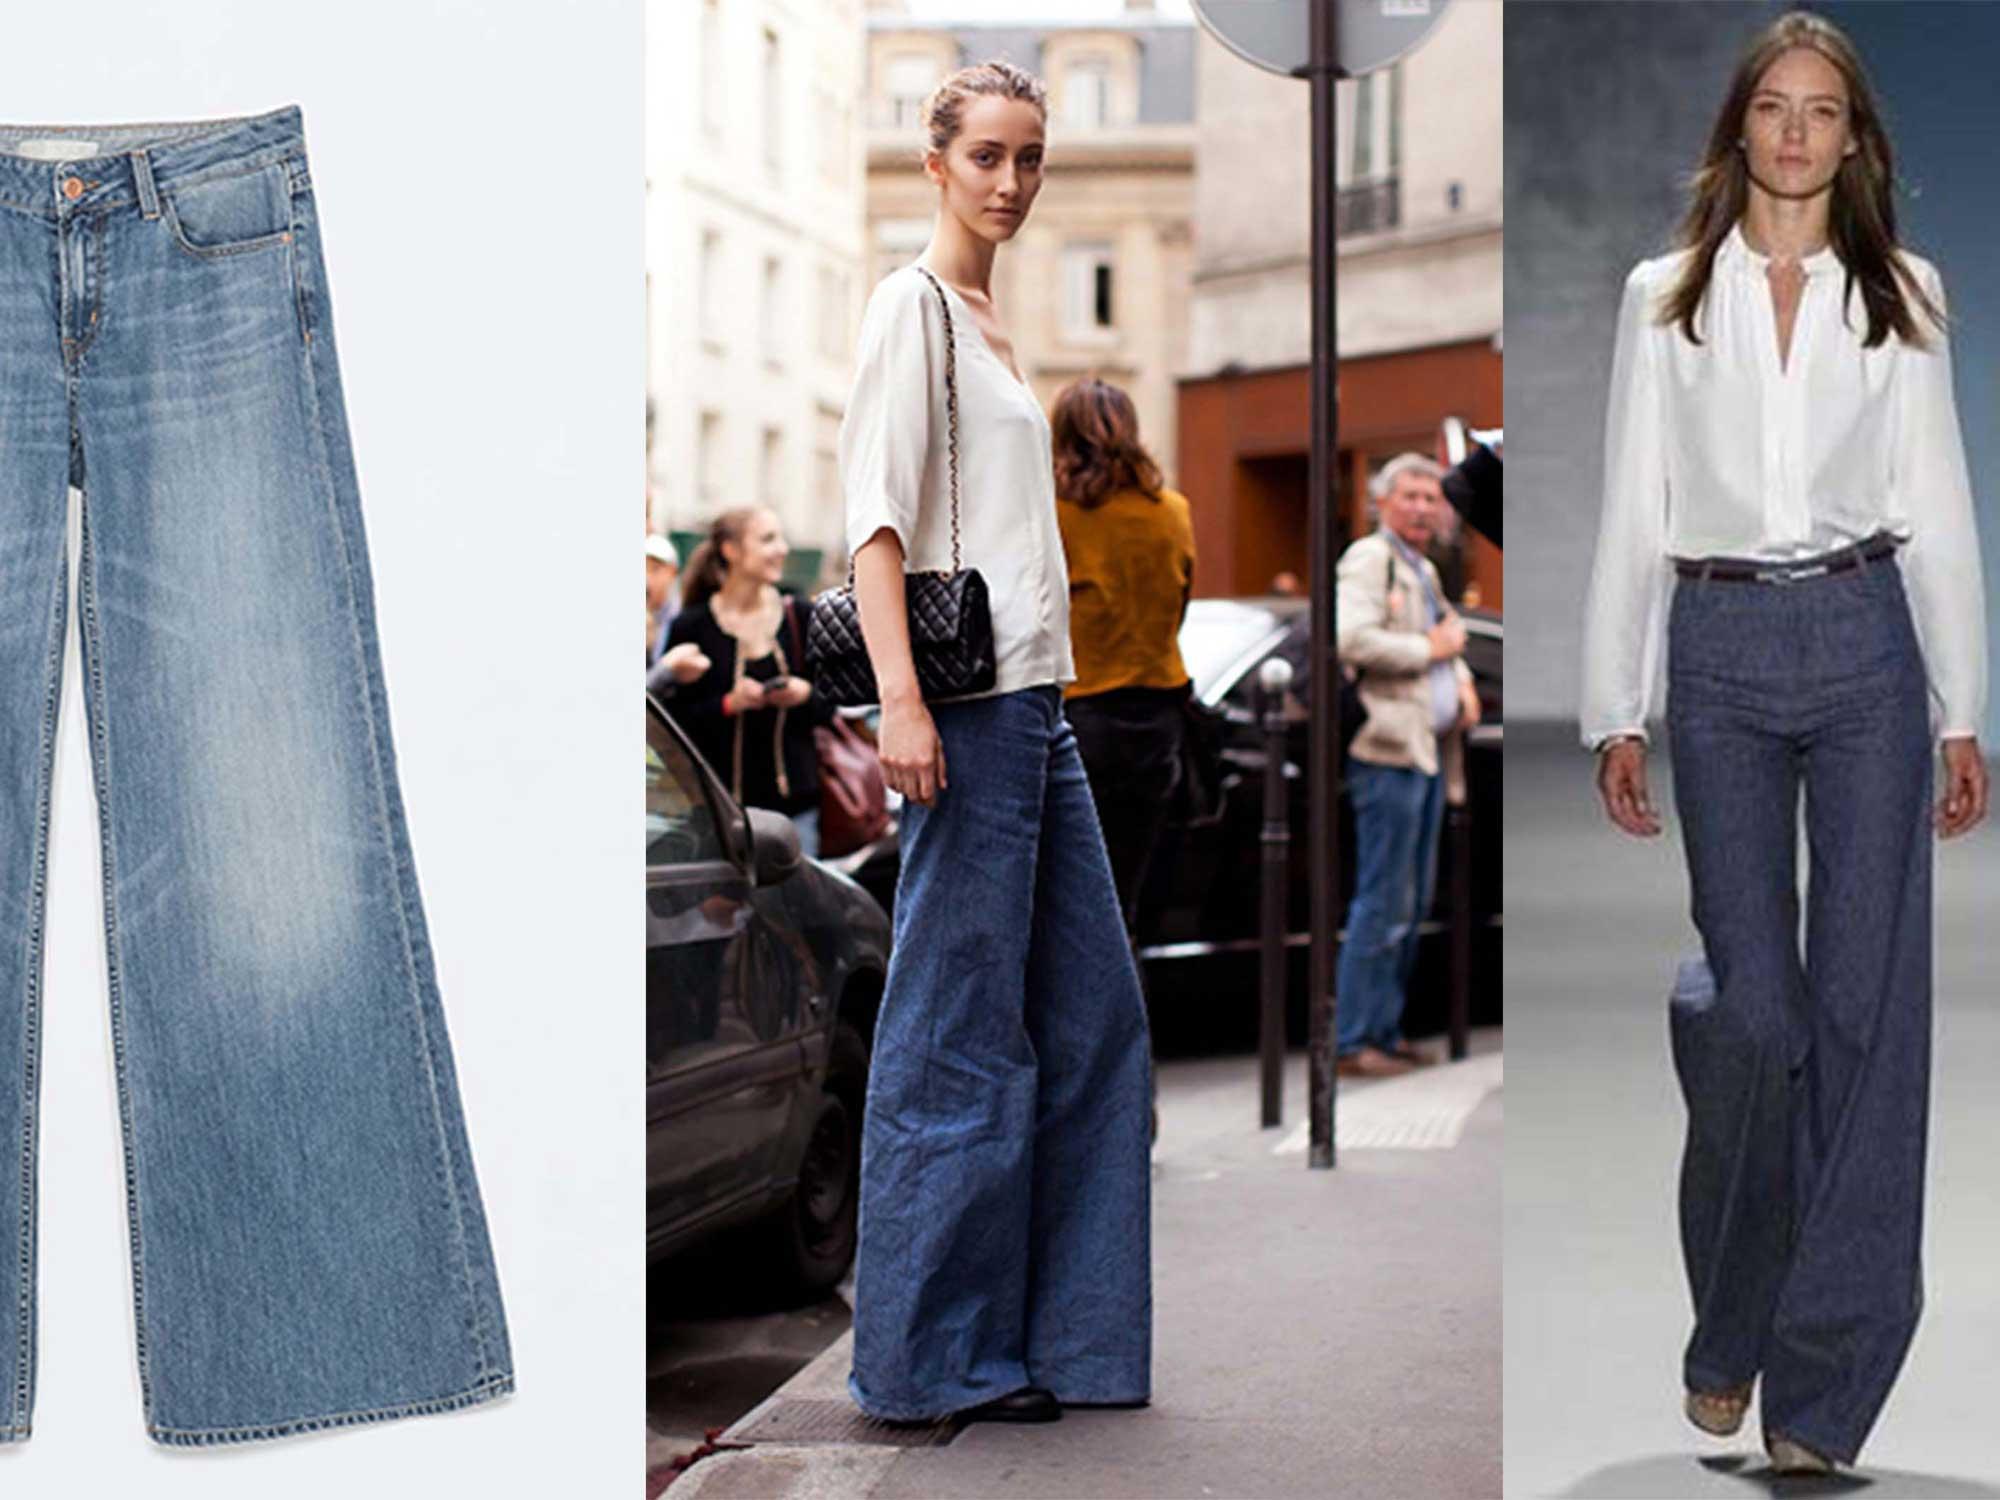 Jeans Jeans Jeans Jeans Jeans Jeans Jeans Jeans Jeans Jeans Jeans Jeans Jeans YH9IWD2Eeb